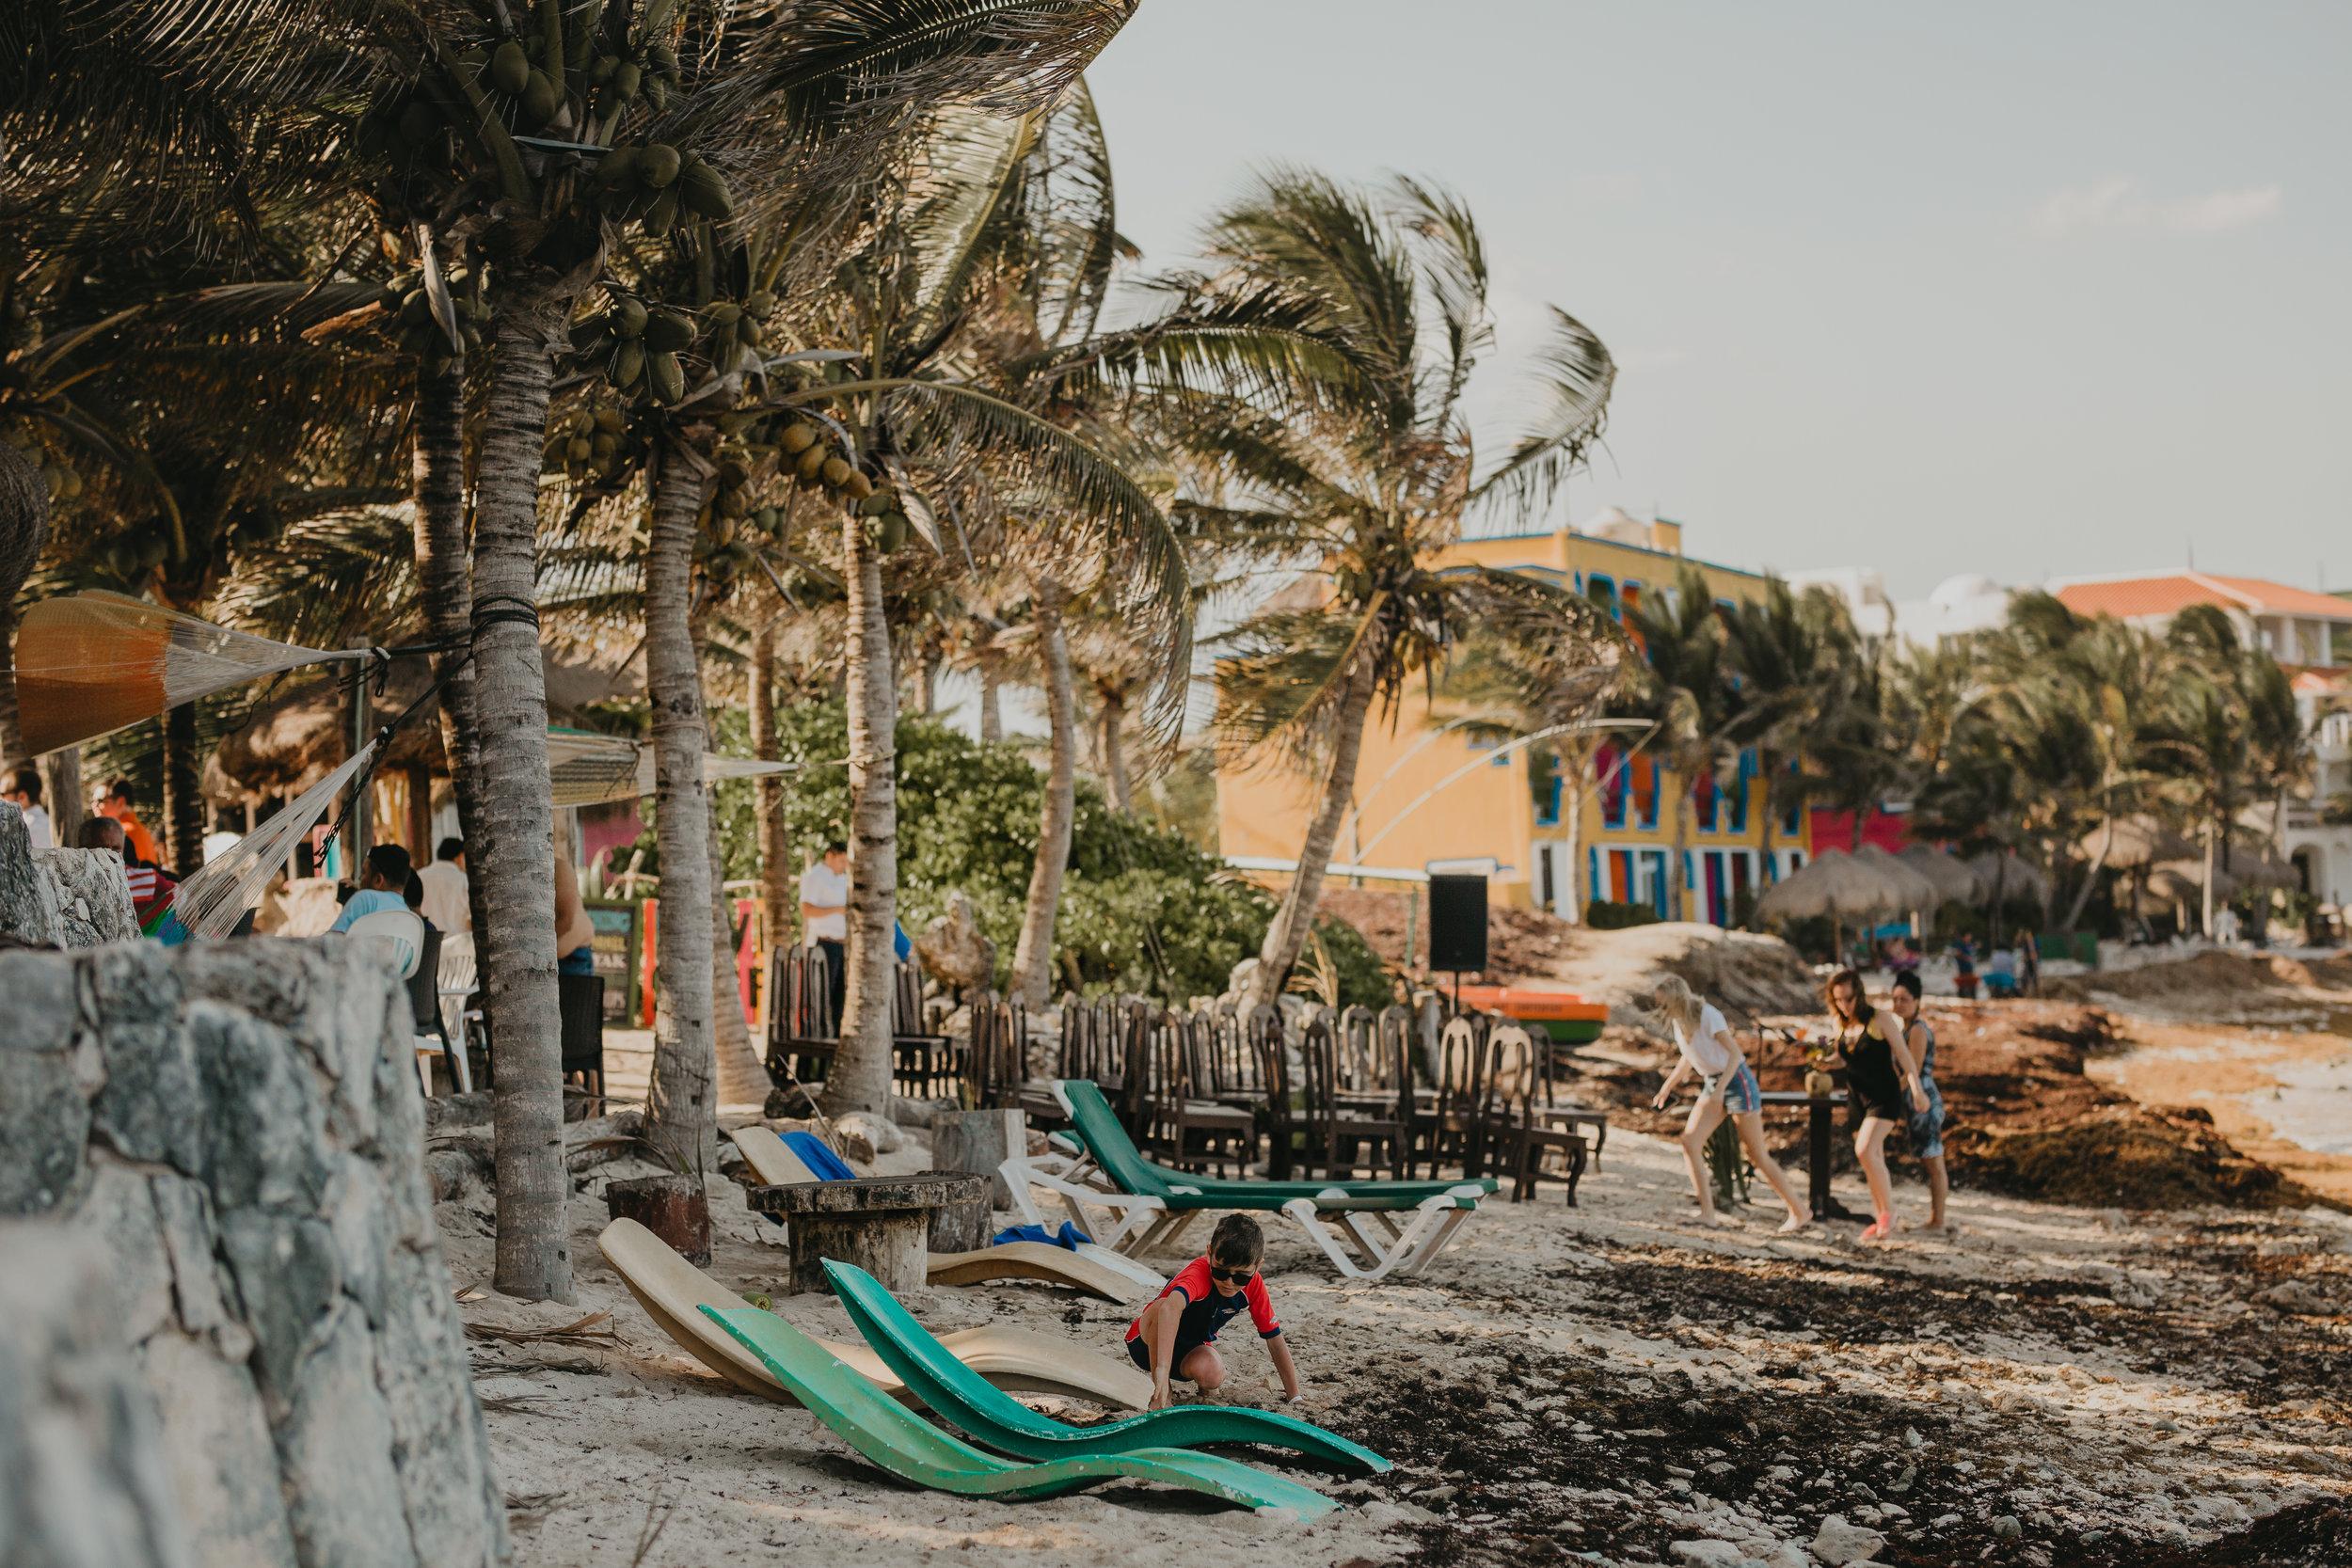 Nicole-Daacke-Photography-beachfront-akumal-destionation-wedding-tulum-mexico-elopement-photographer-destination-wedding-inspiration-sunset-champagne-pop-boho-bride-ocean-tropical-bohemian-tulum-wedding-photos-147.jpg